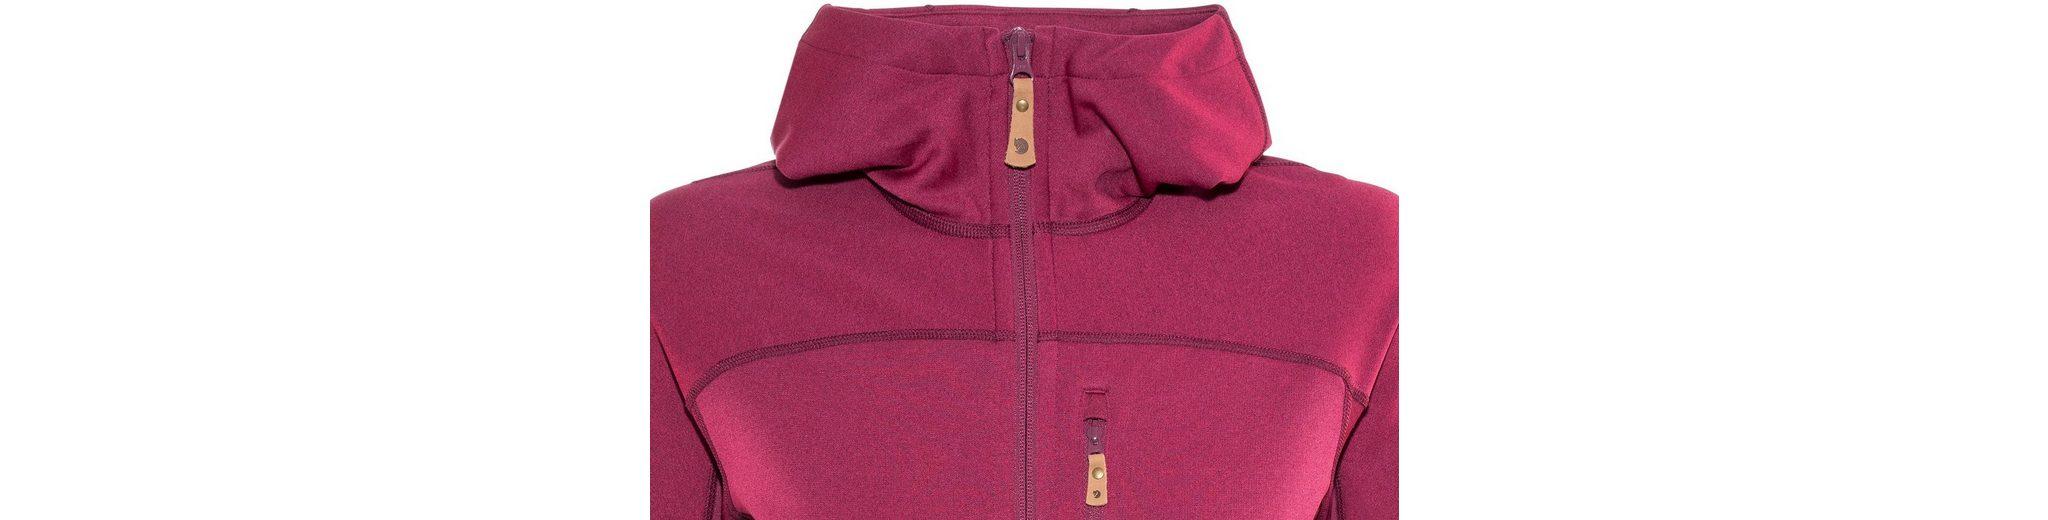 FJÄLLRÄVEN Outdoorjacke Abisko Trail Fleece Jacket Women Shop Selbst Günstiger Preis In Deutschland ppD0RIi